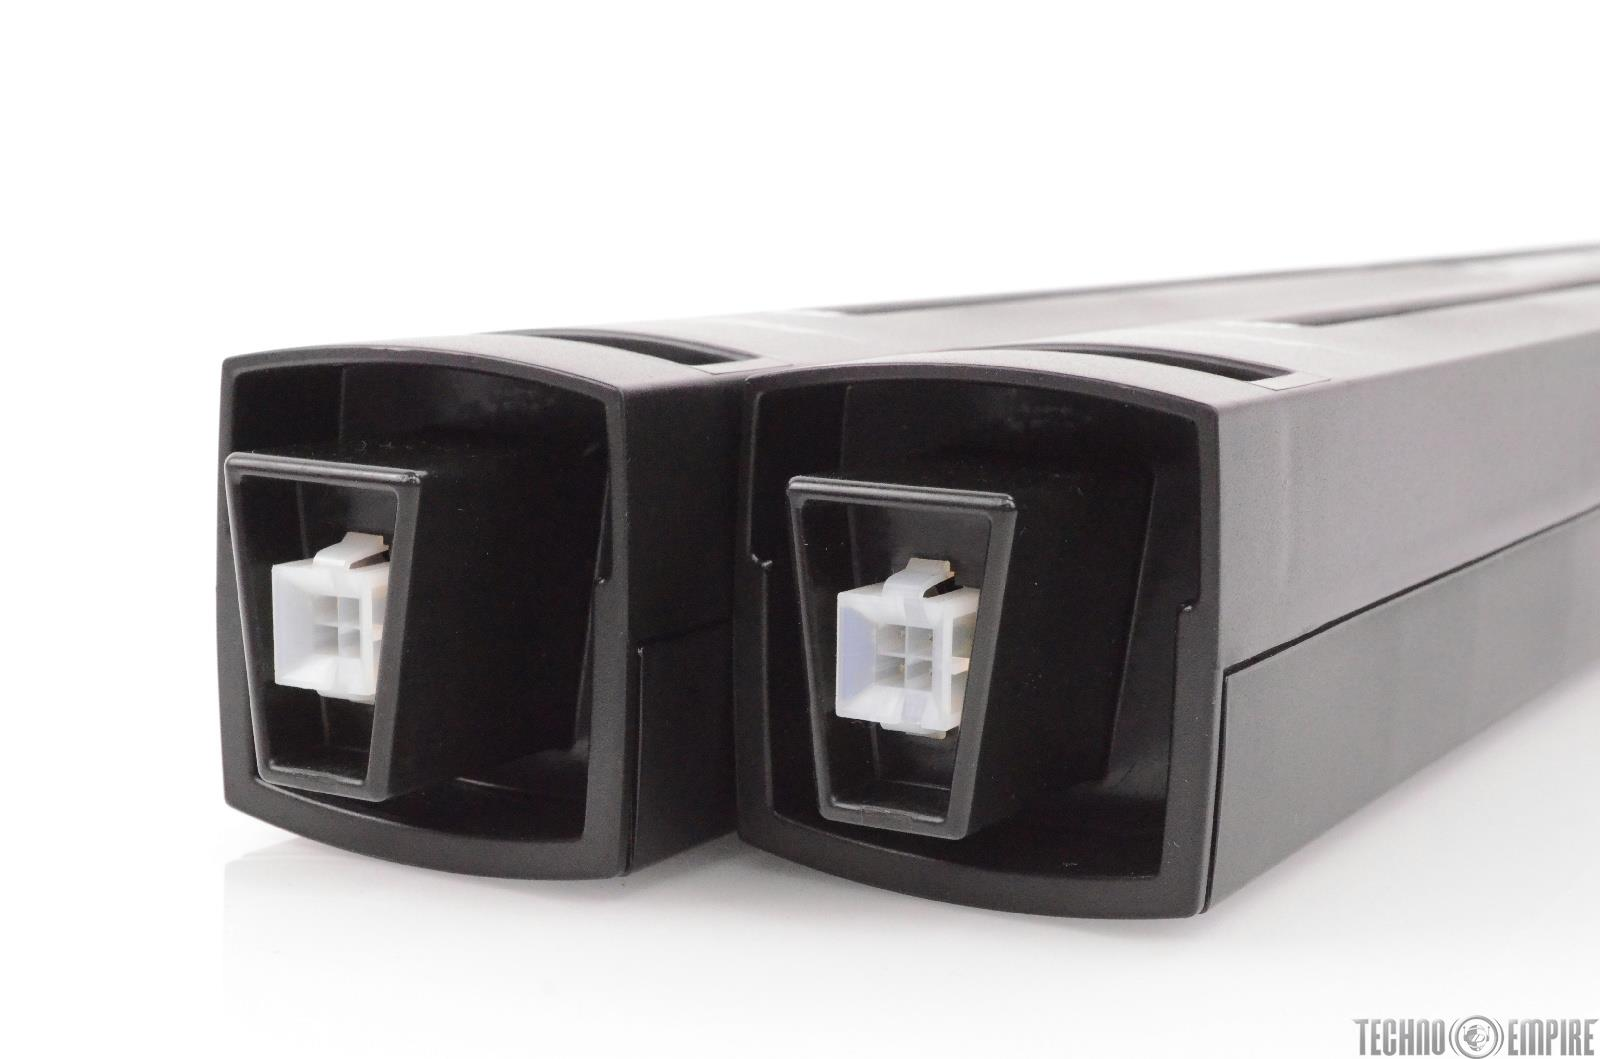 bose l1 compact portable line array system compact pa unit. Black Bedroom Furniture Sets. Home Design Ideas